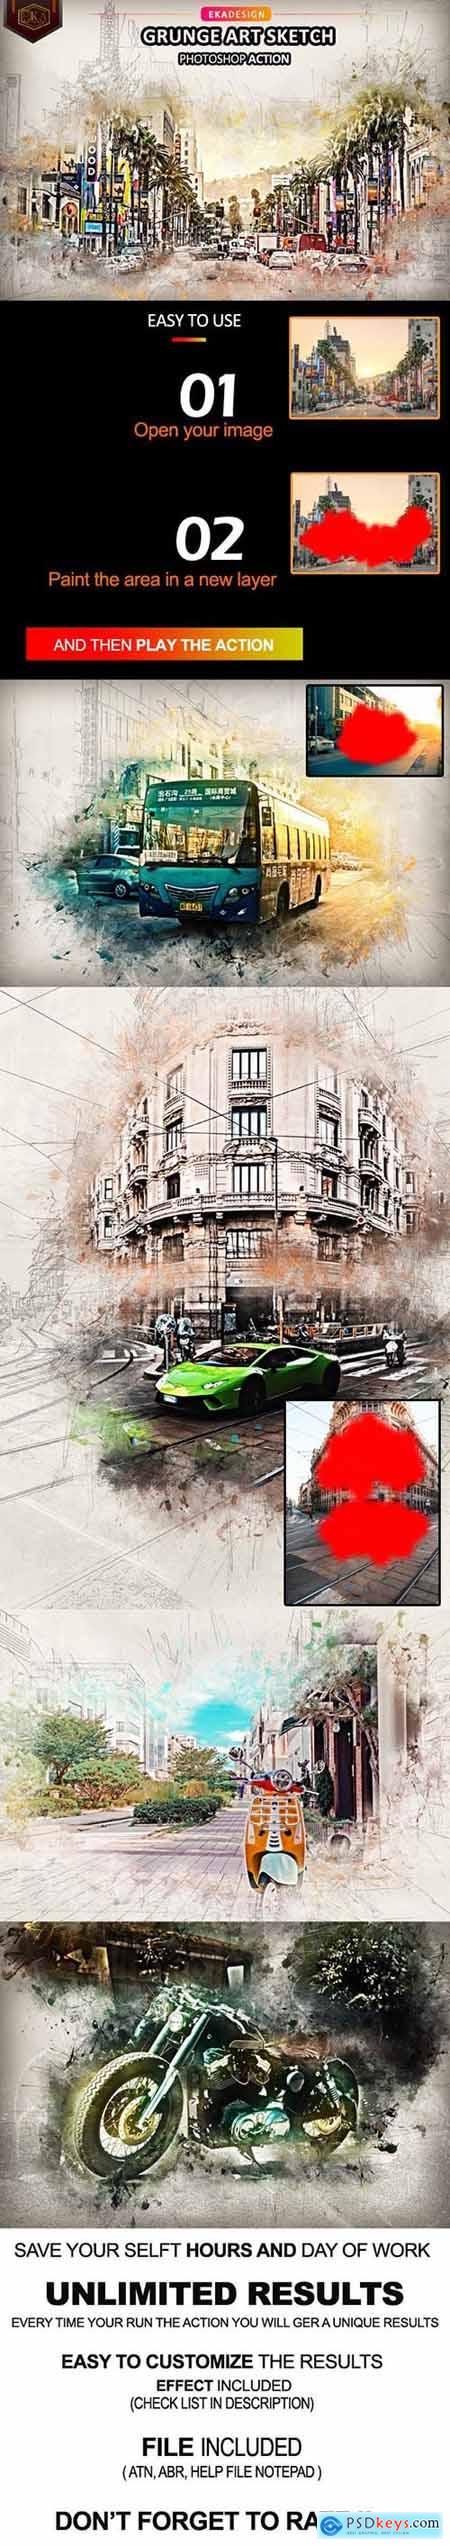 Grunge Art Sketch Photosop Action 32980106